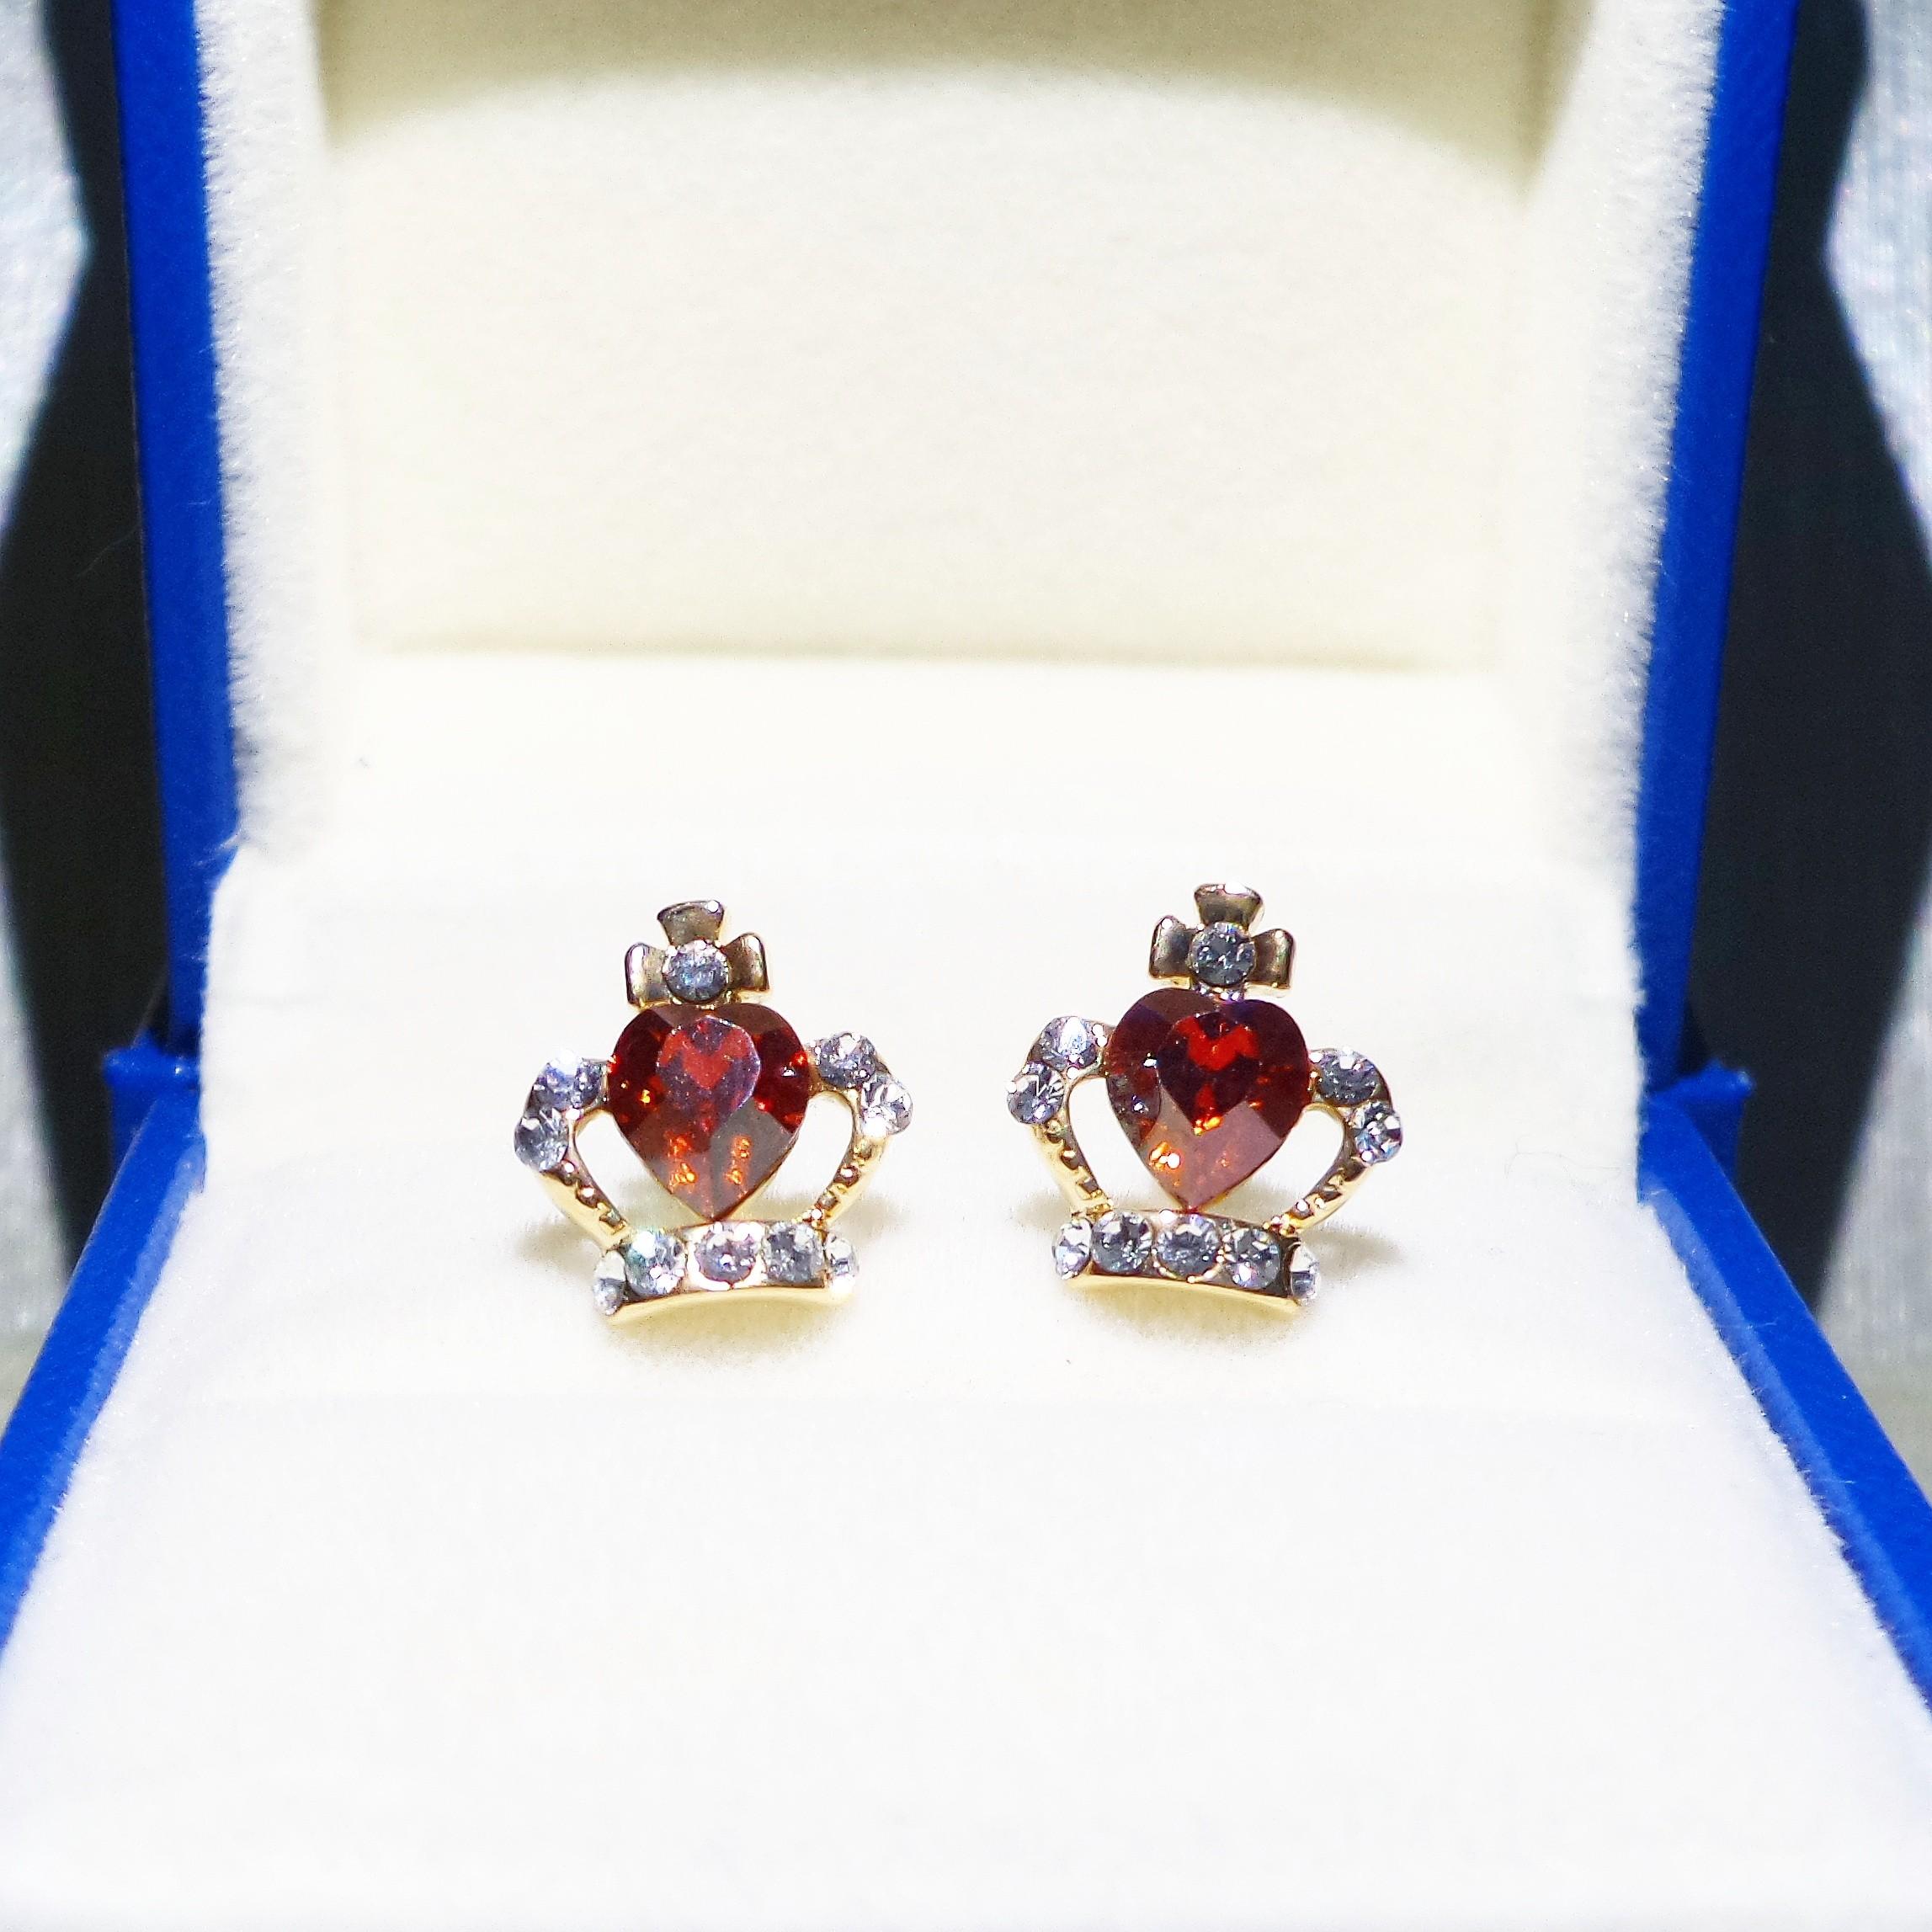 Tundra Crown Earring - AS17025